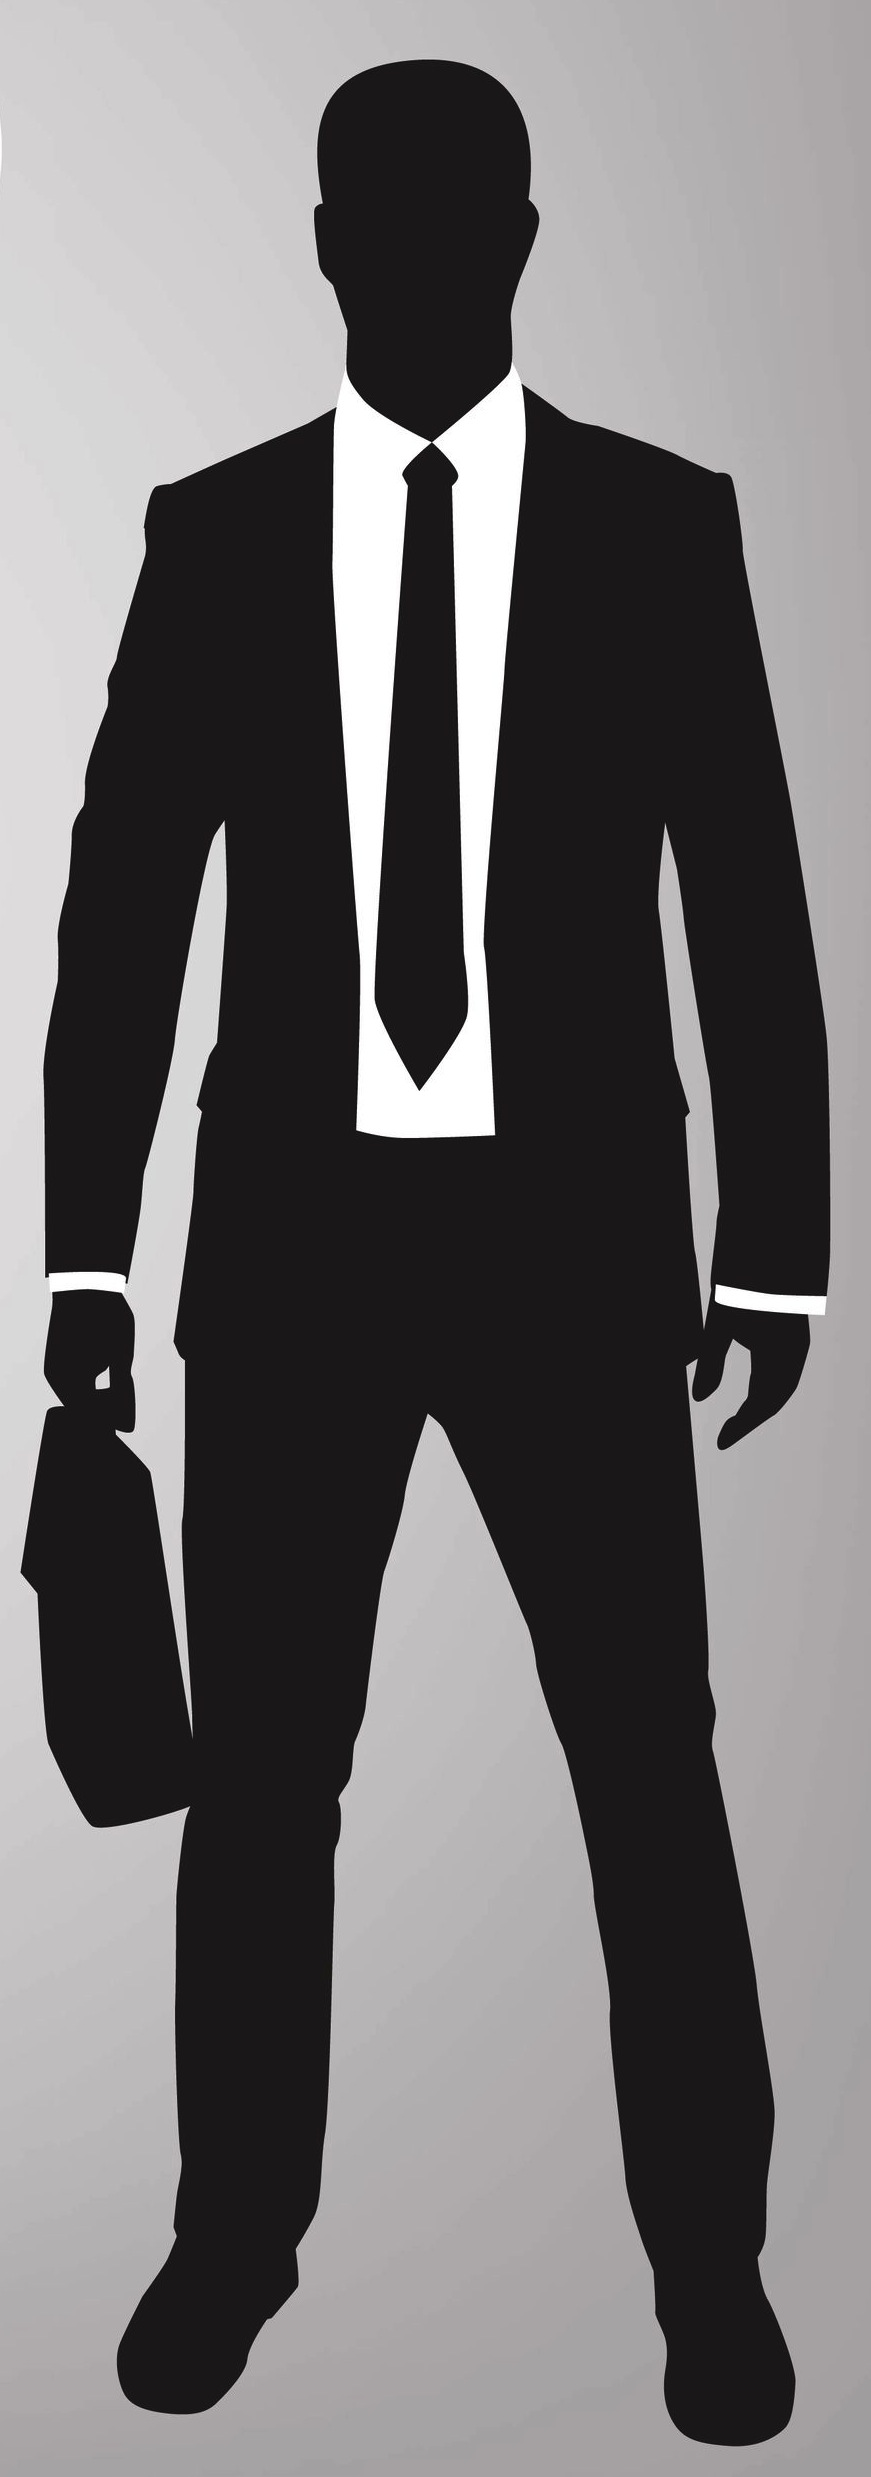 cosmonaut space suit silhouette - photo #10